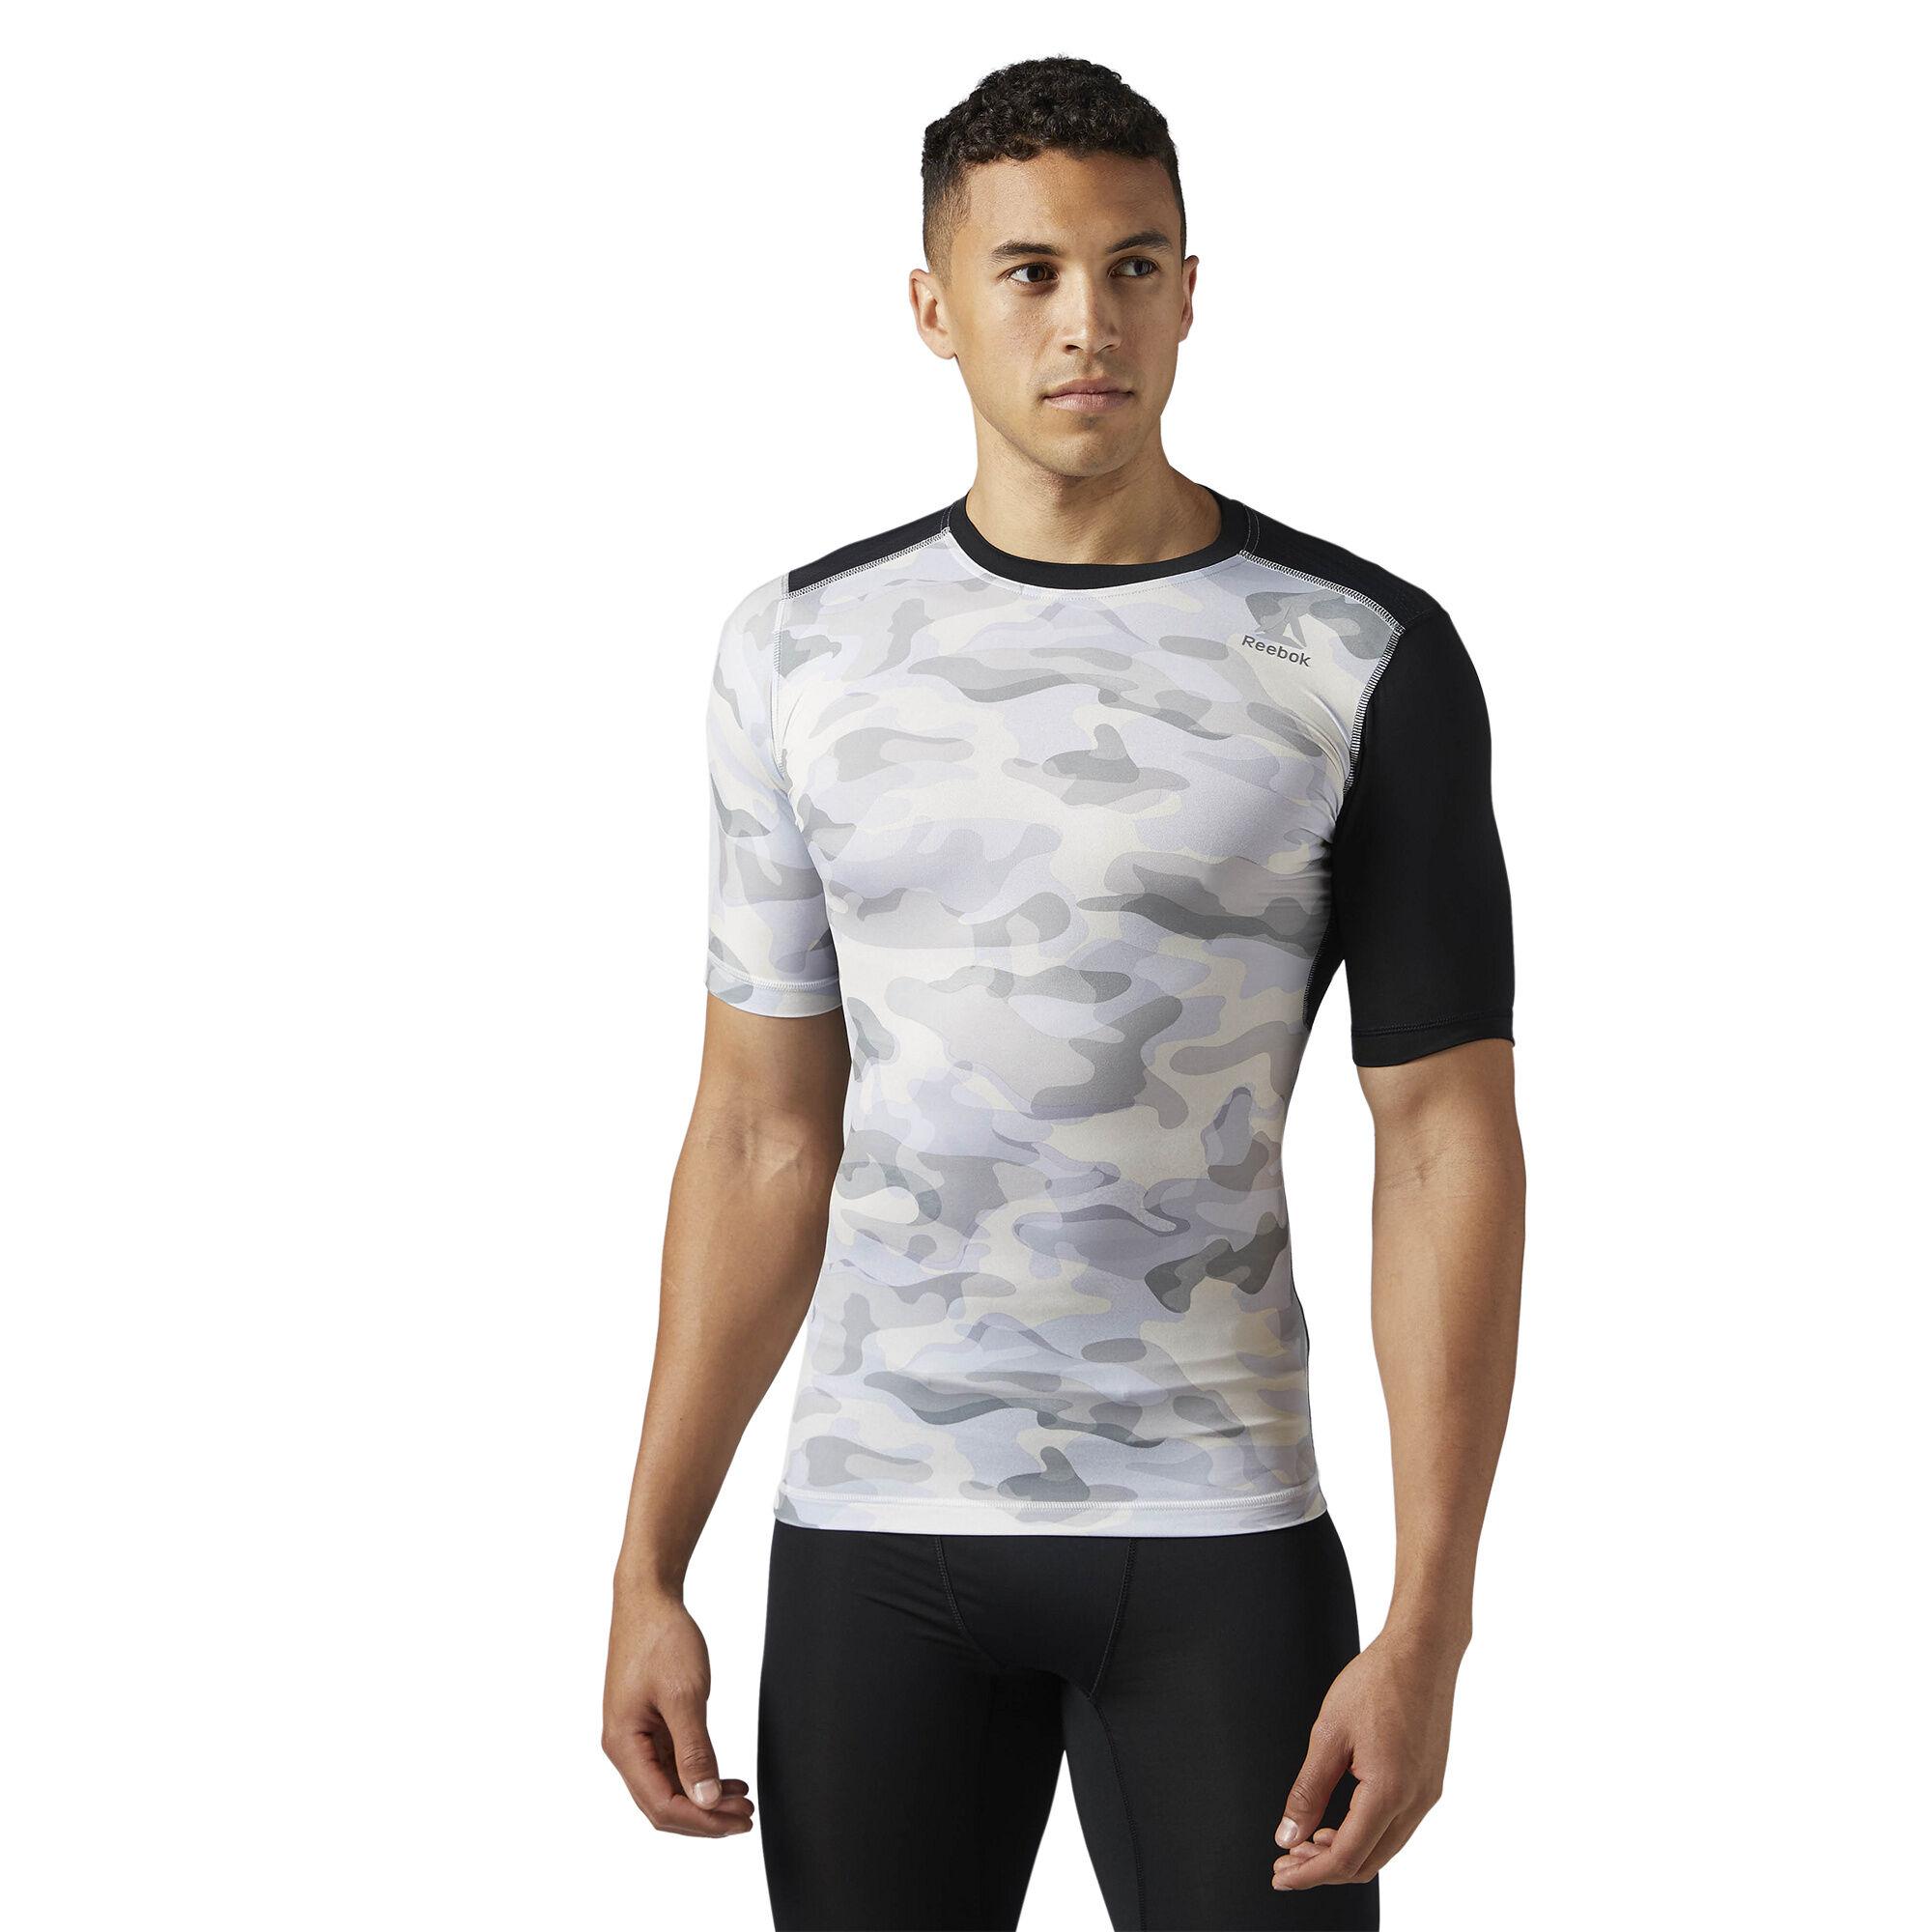 Reebok Sport ACTIVCHILL Graphic Compression Tee men Shirts /& Tops Green